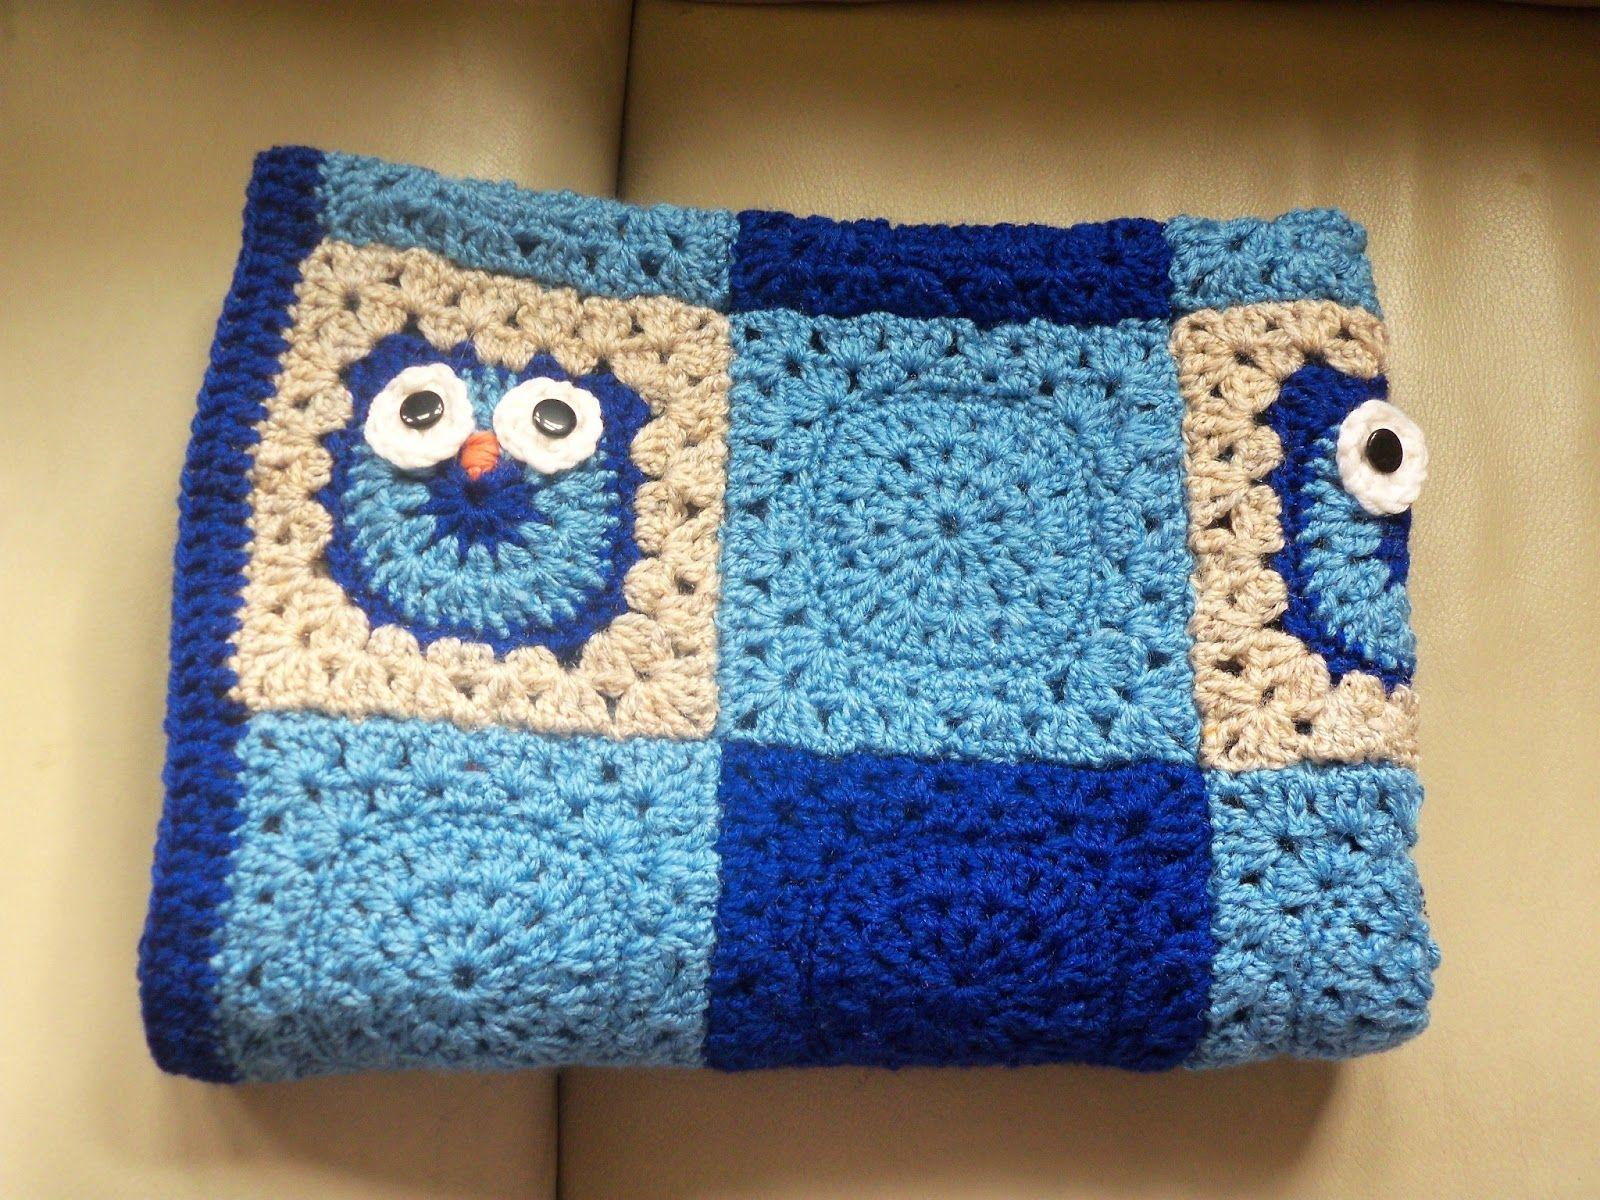 Free+Crochet+Owl+Blanket+Patterns | The Suburban Daffodil | crochet ...